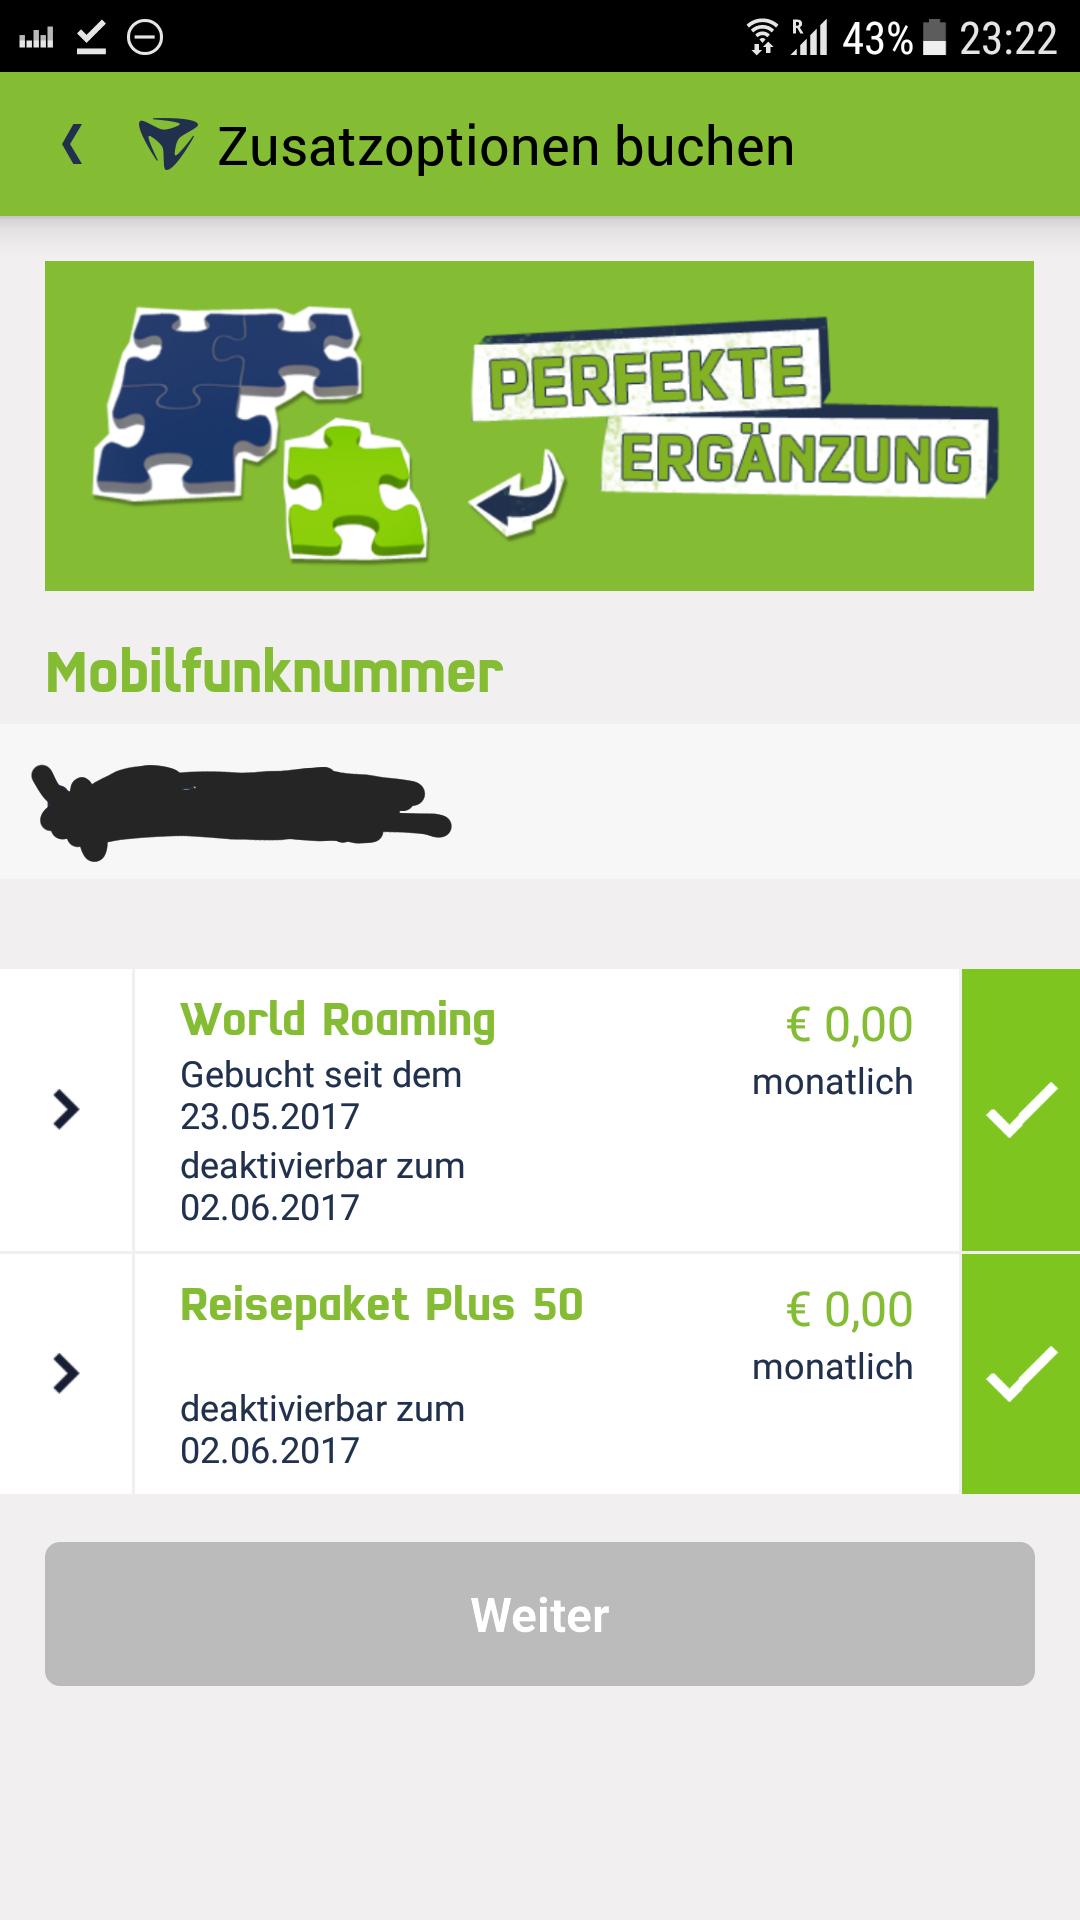 Reisepass plus 50 - Vodafone MobilCom